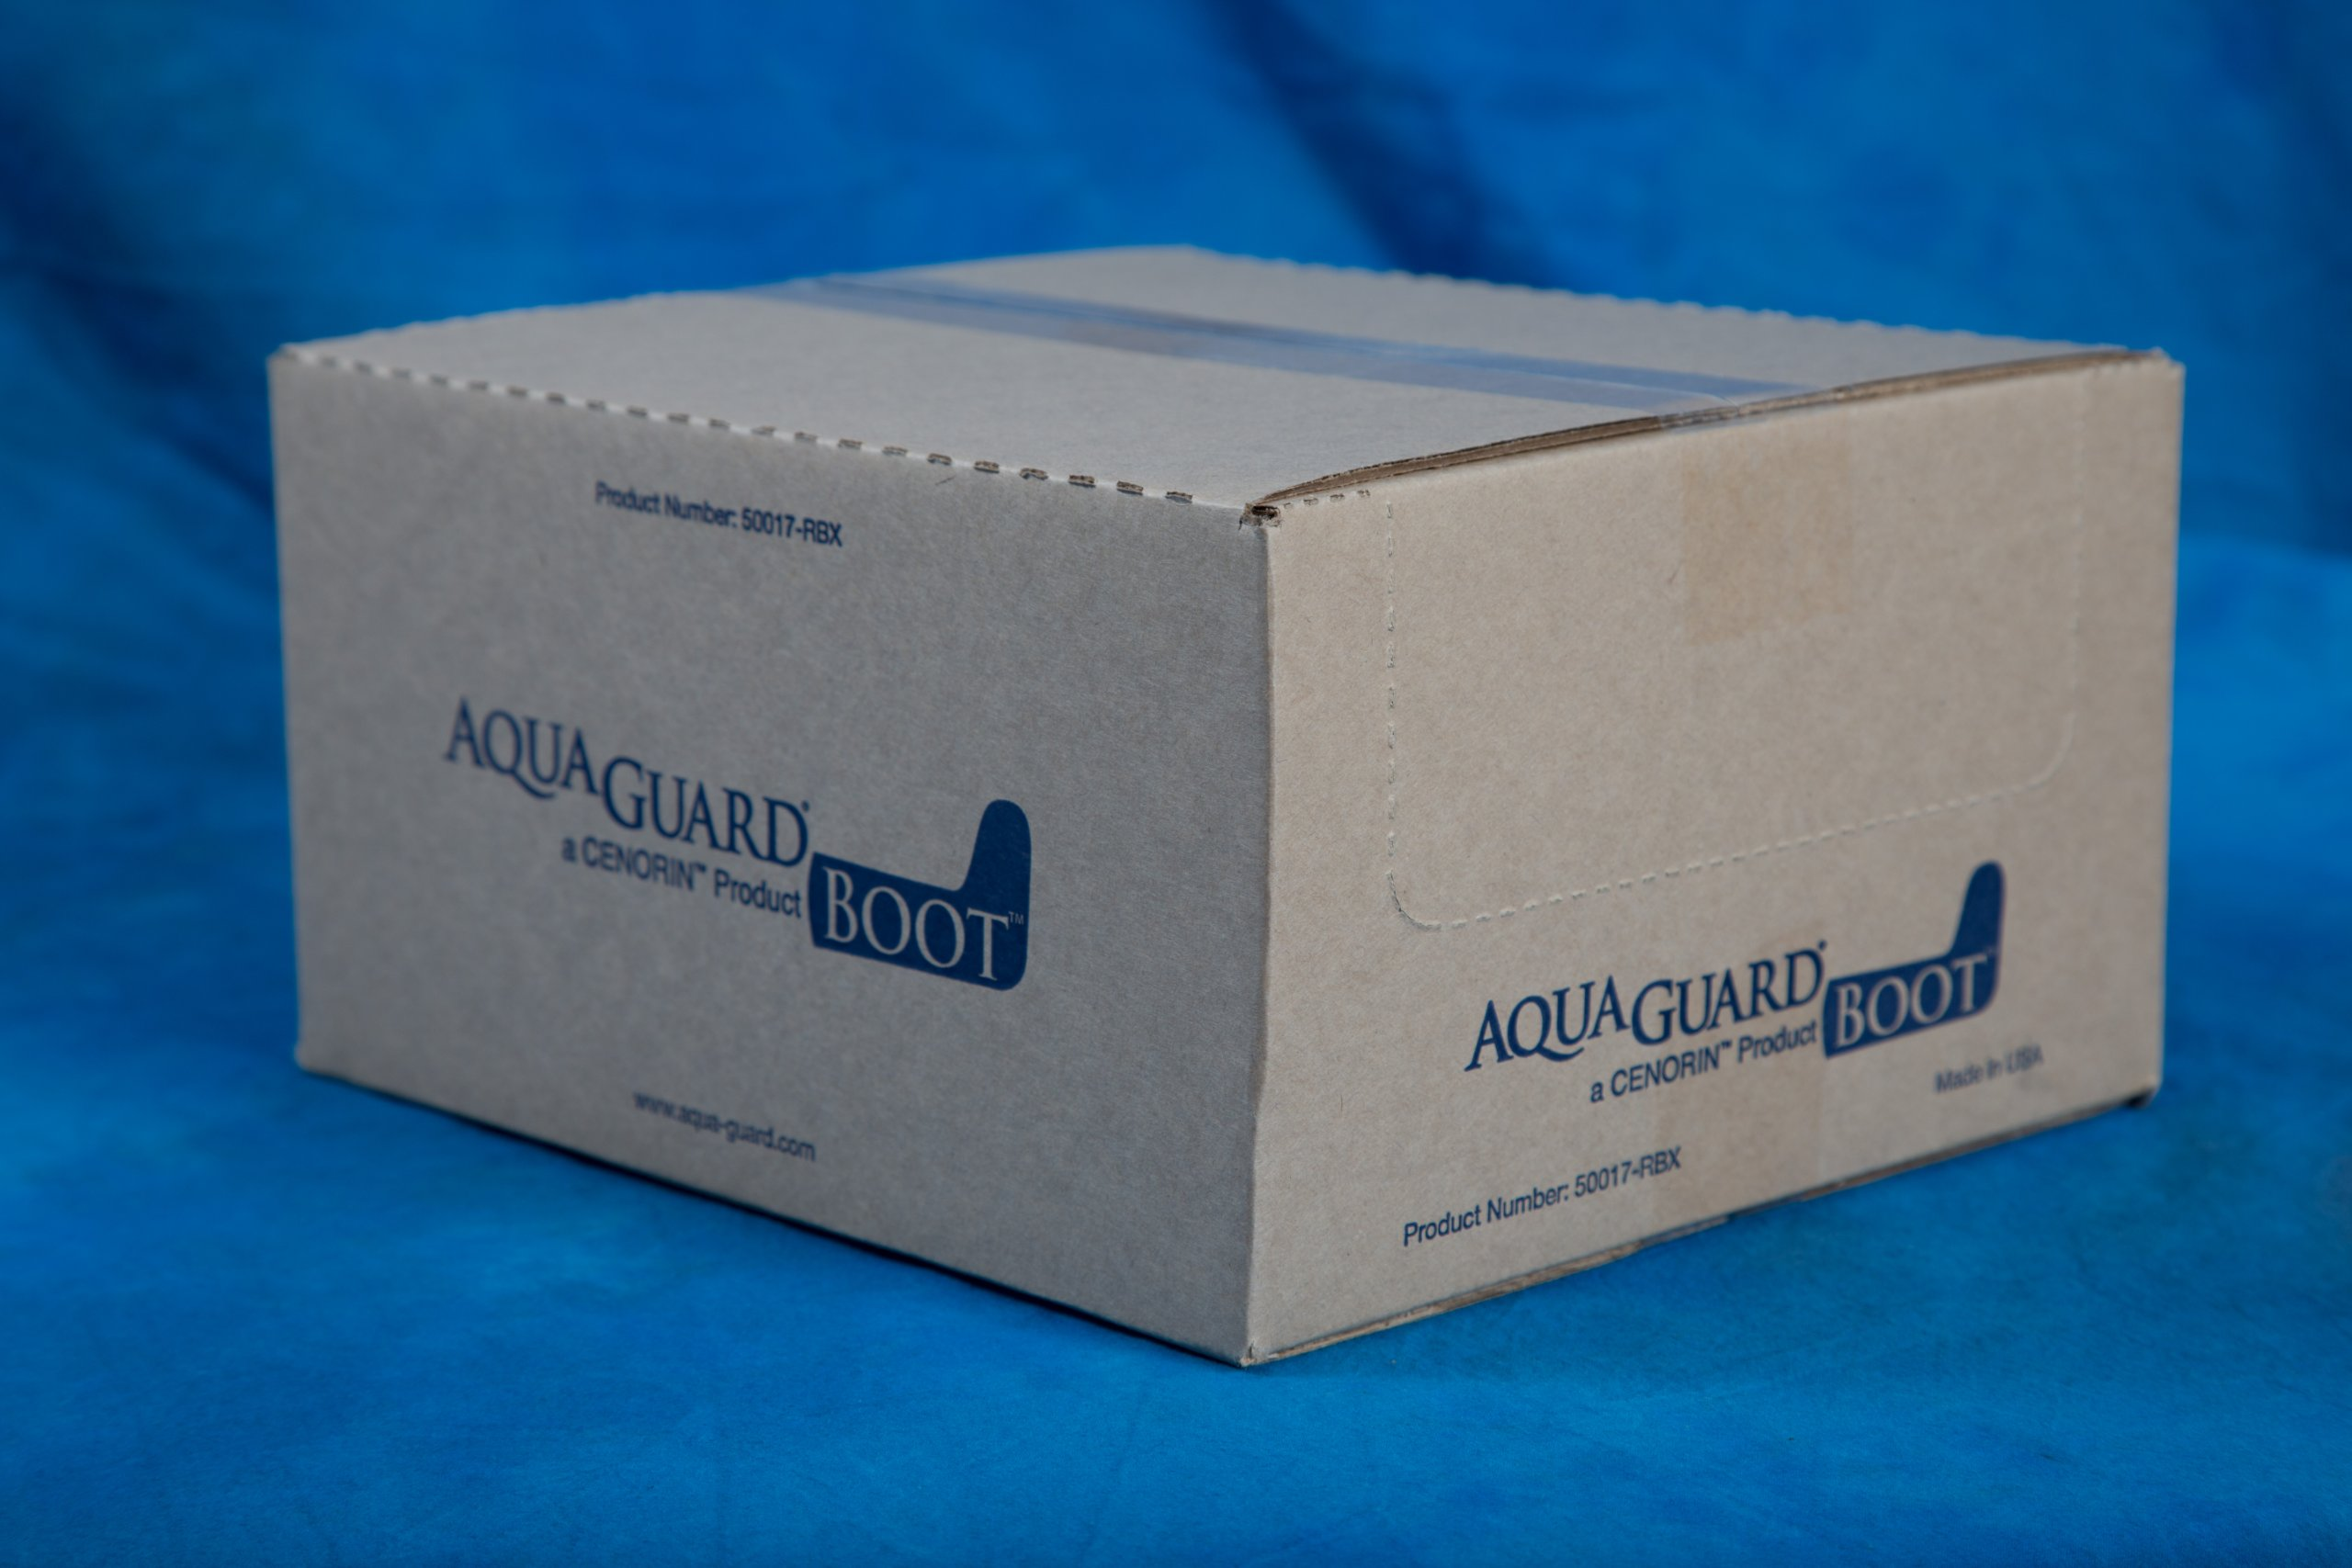 AquaGuard Boot Cast Cover Moisture Barrier (Case of 25)